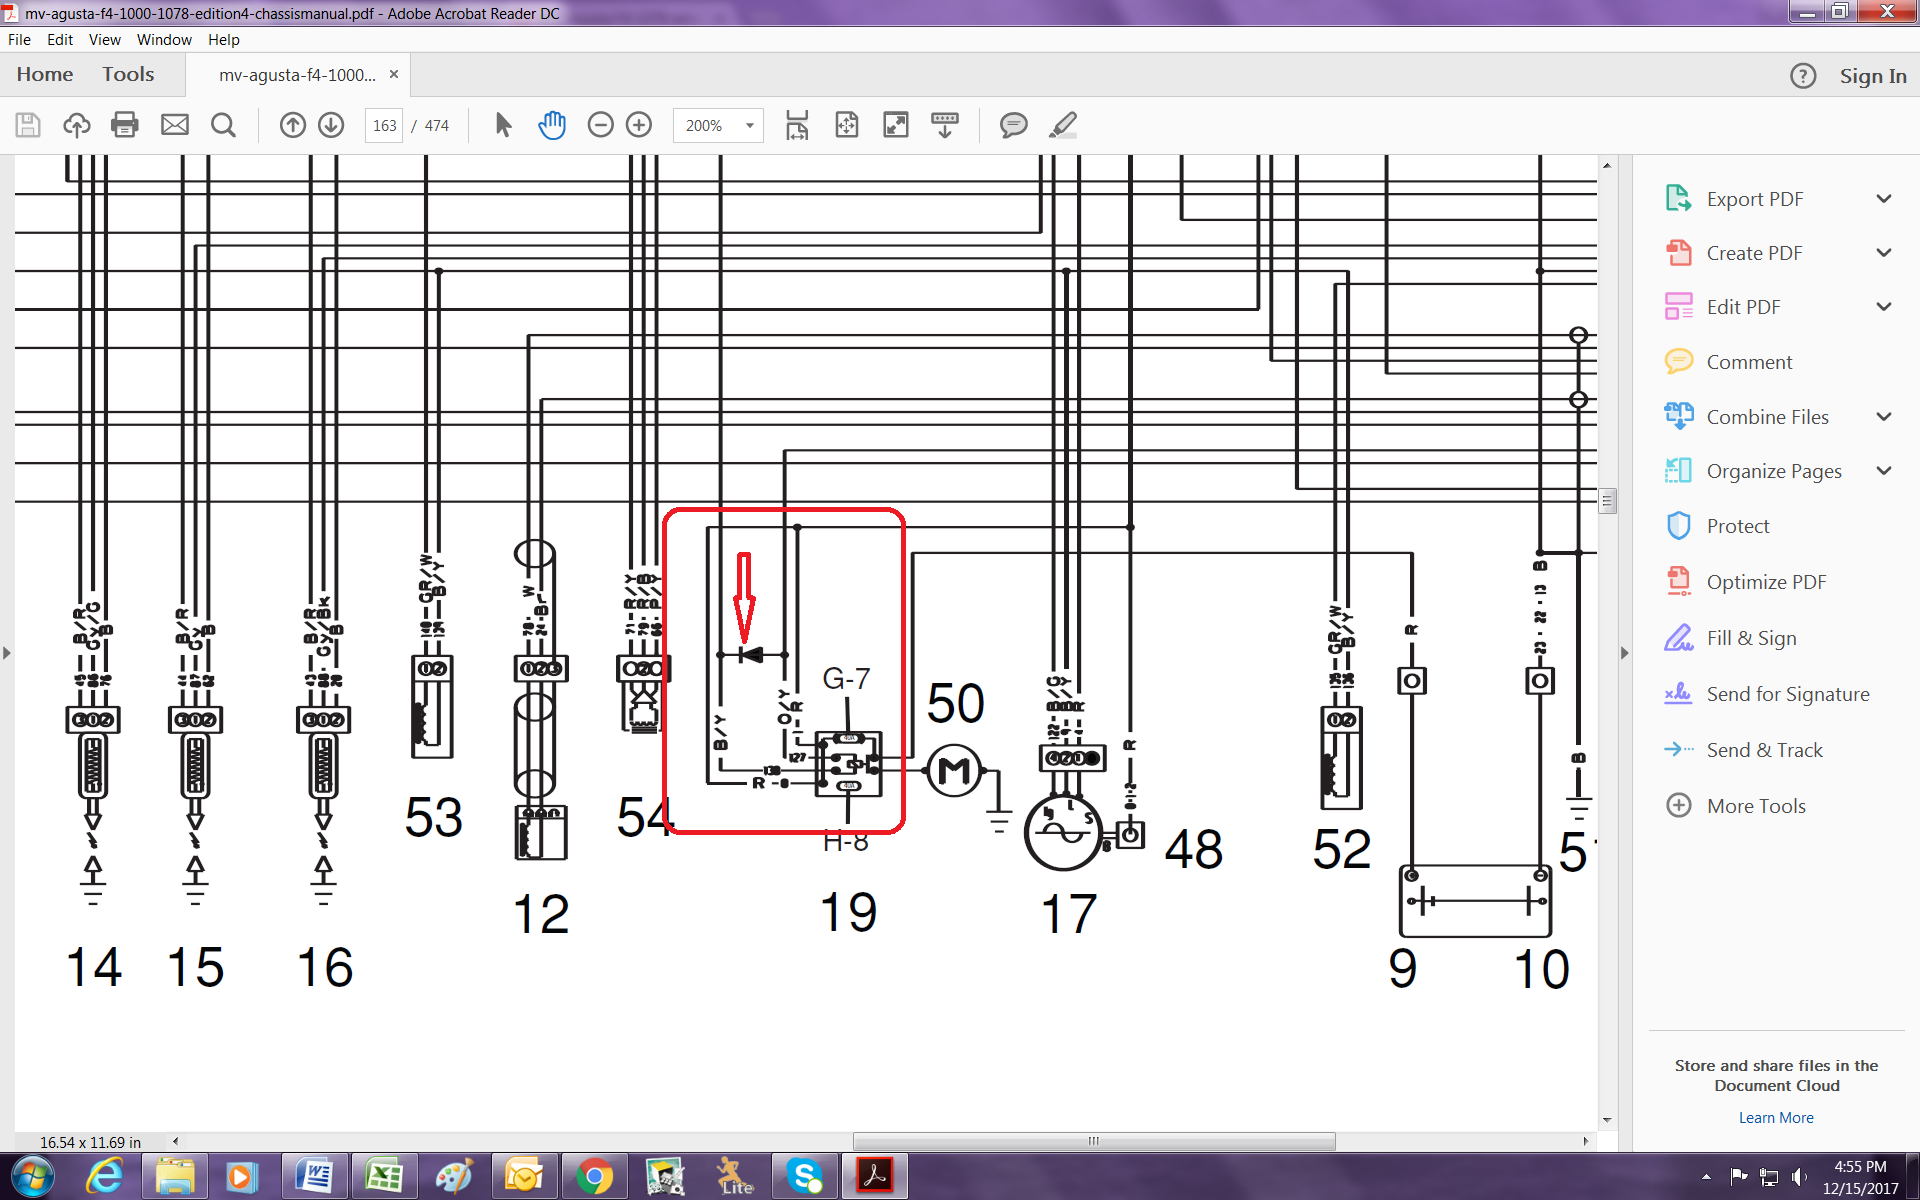 Mv Agusta Brutale Wiring Diagram - Aprilia Tuono Wiring Diagram  scheme-wirings.au-delice-limousin.fr | Mv Agusta Brutale Wiring Diagram |  | Bege Place Wiring Diagram - Bege Wiring Diagram Full Edition